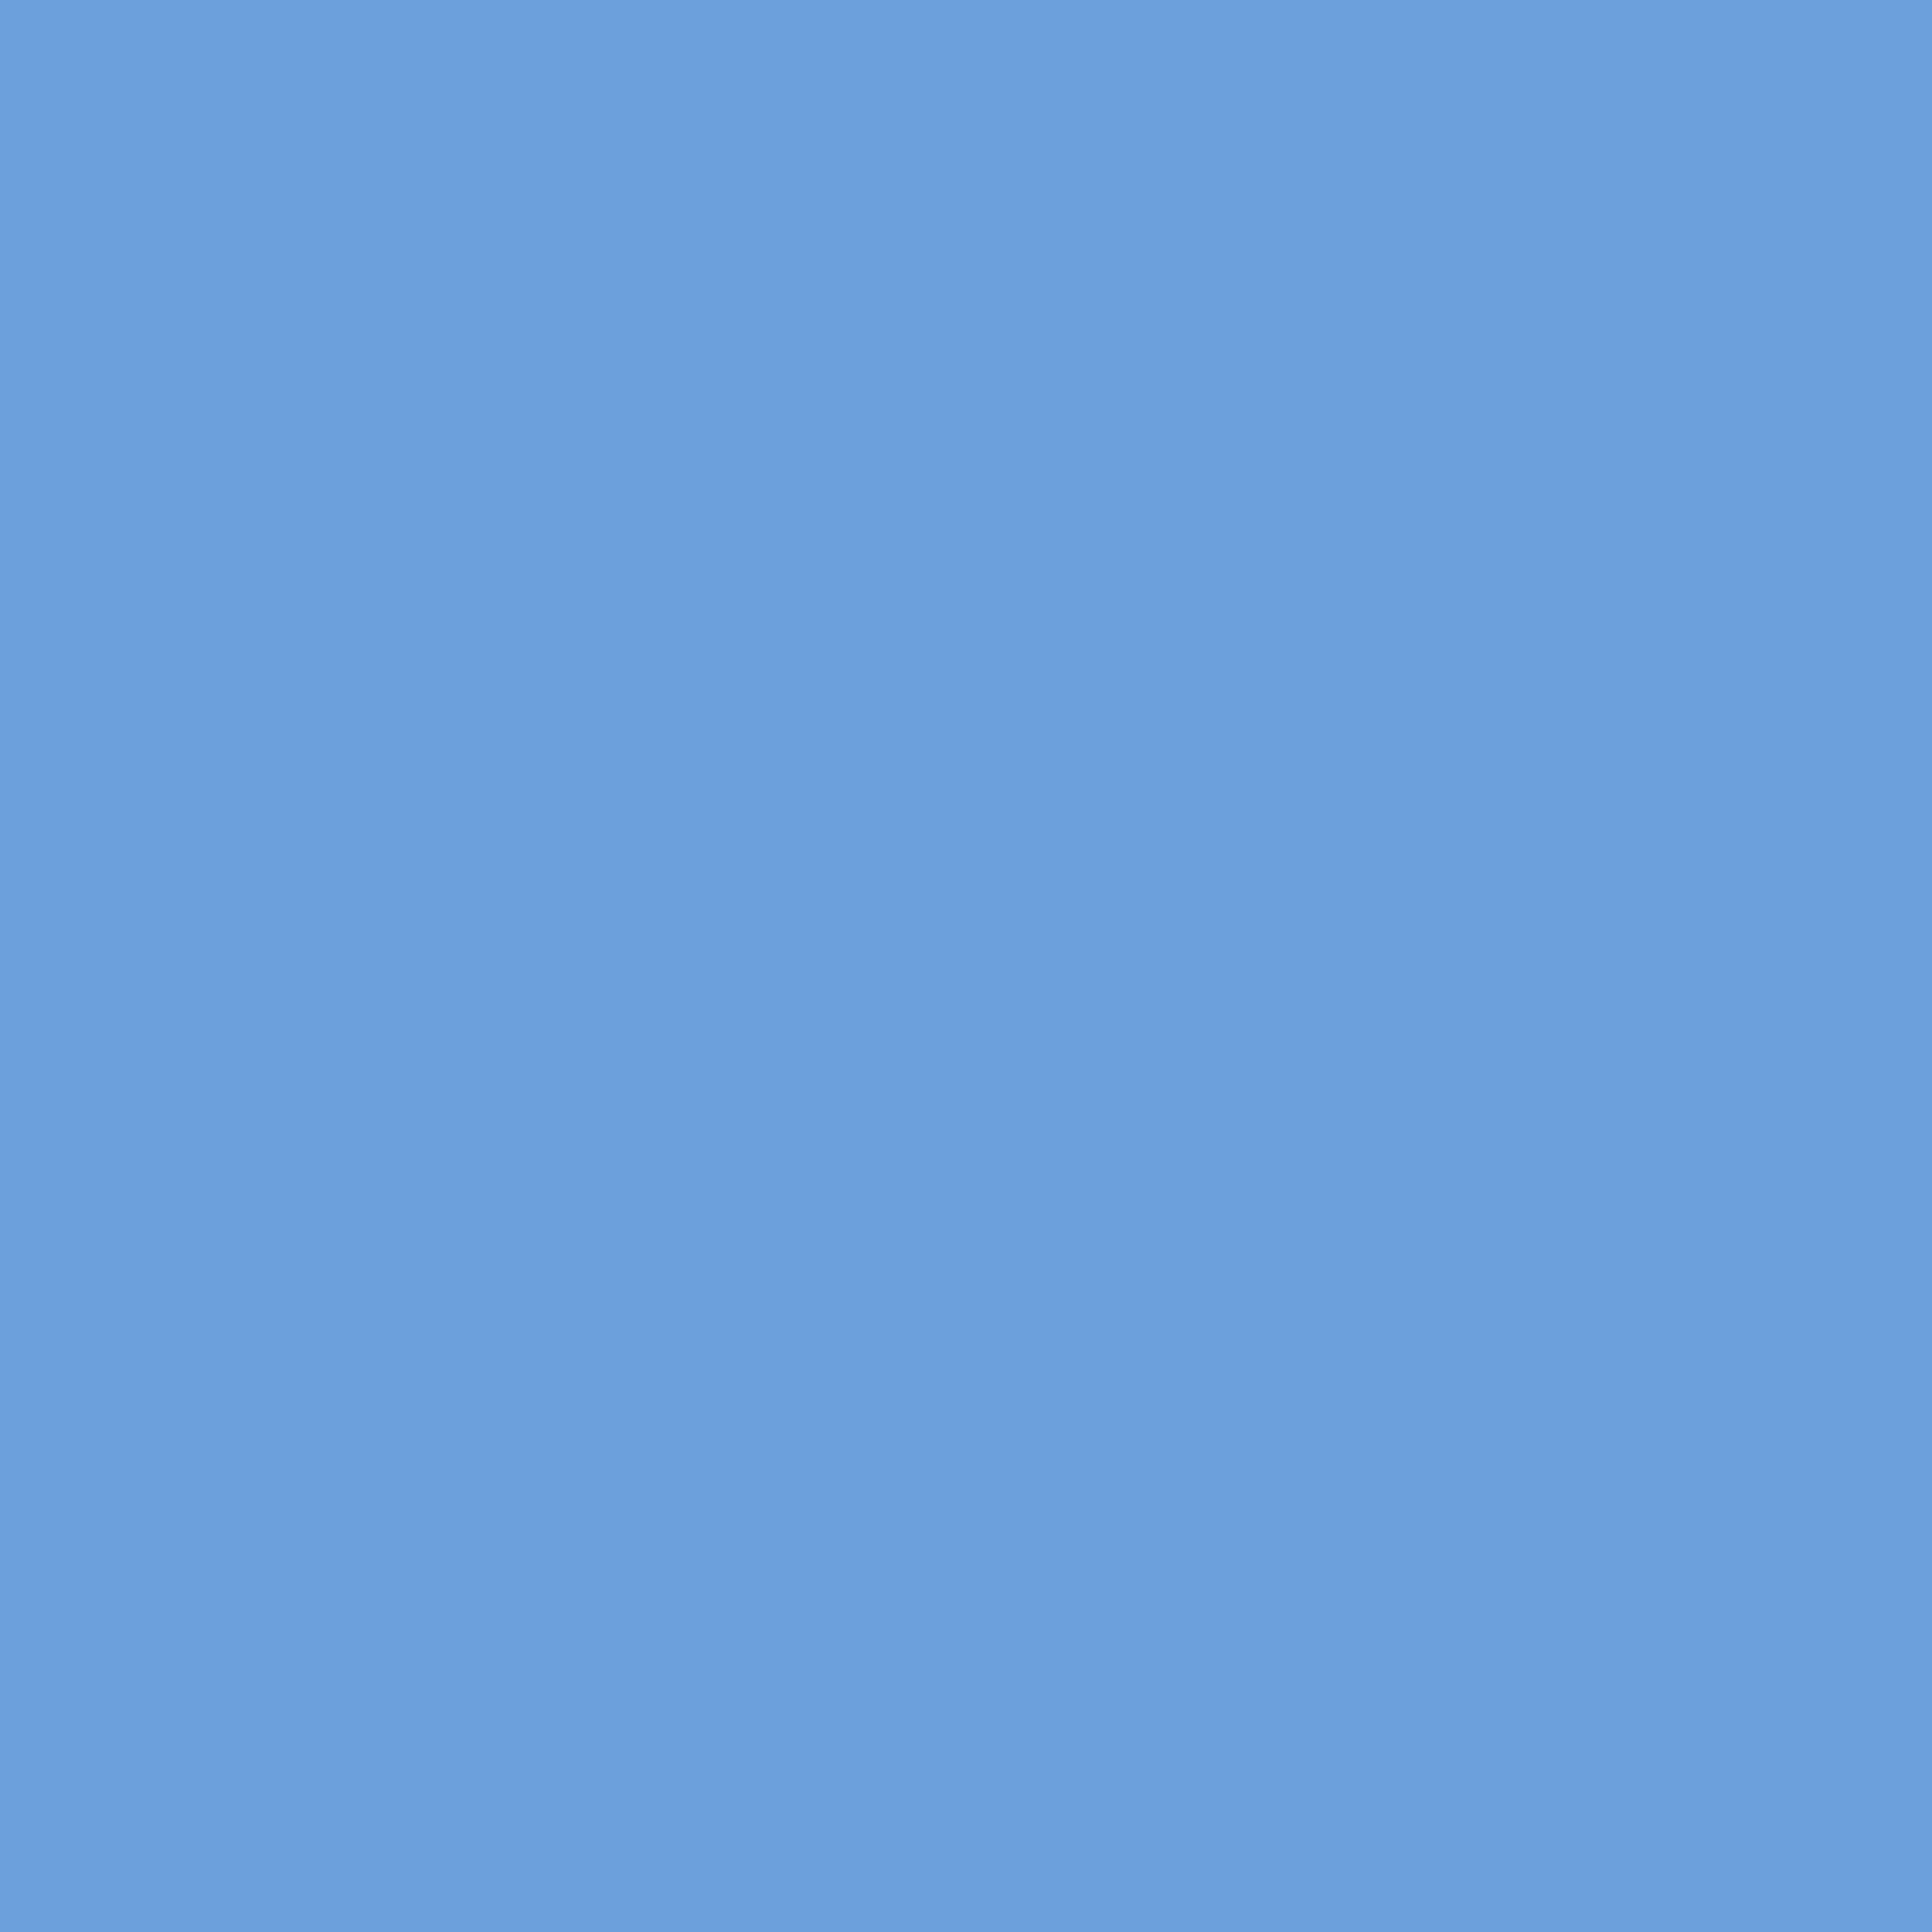 3600x3600 Little Boy Blue Solid Color Background